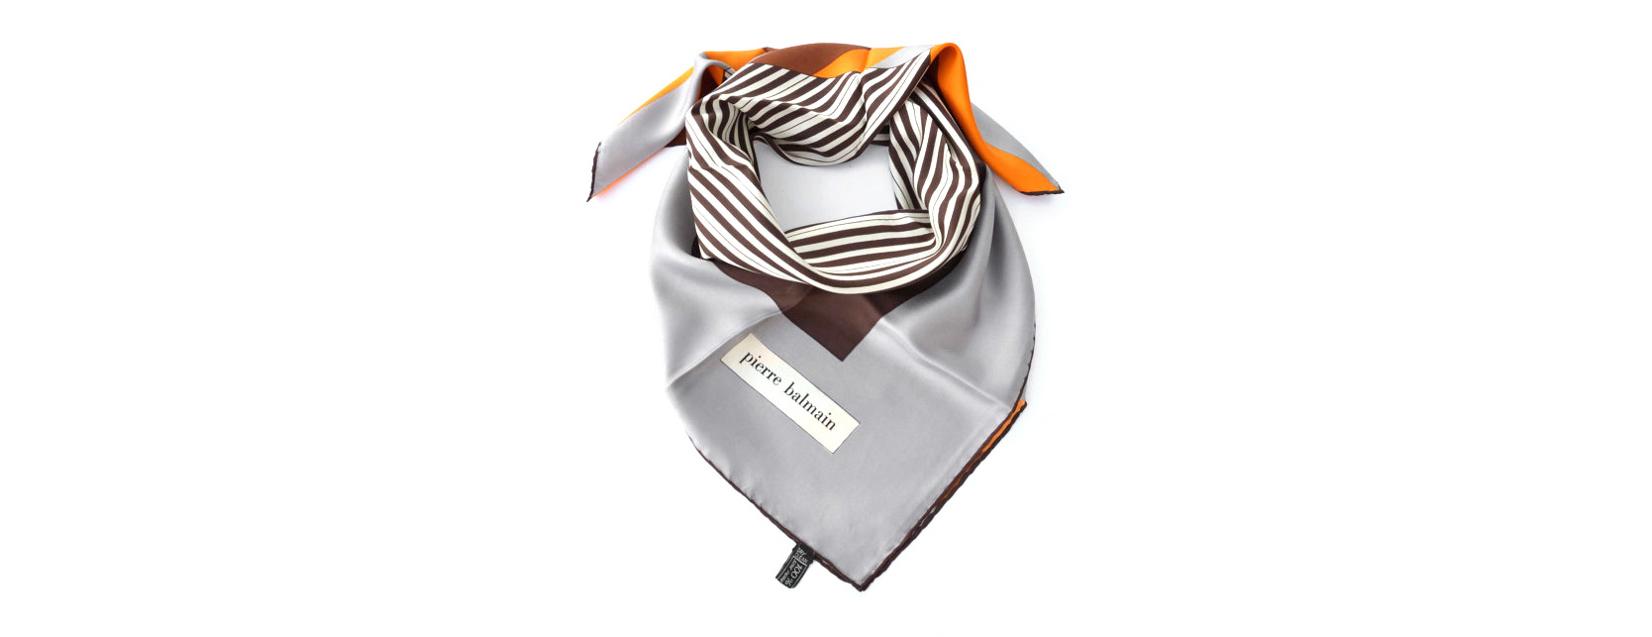 Balmain silk scarf - vintage | Scandinavia Standard